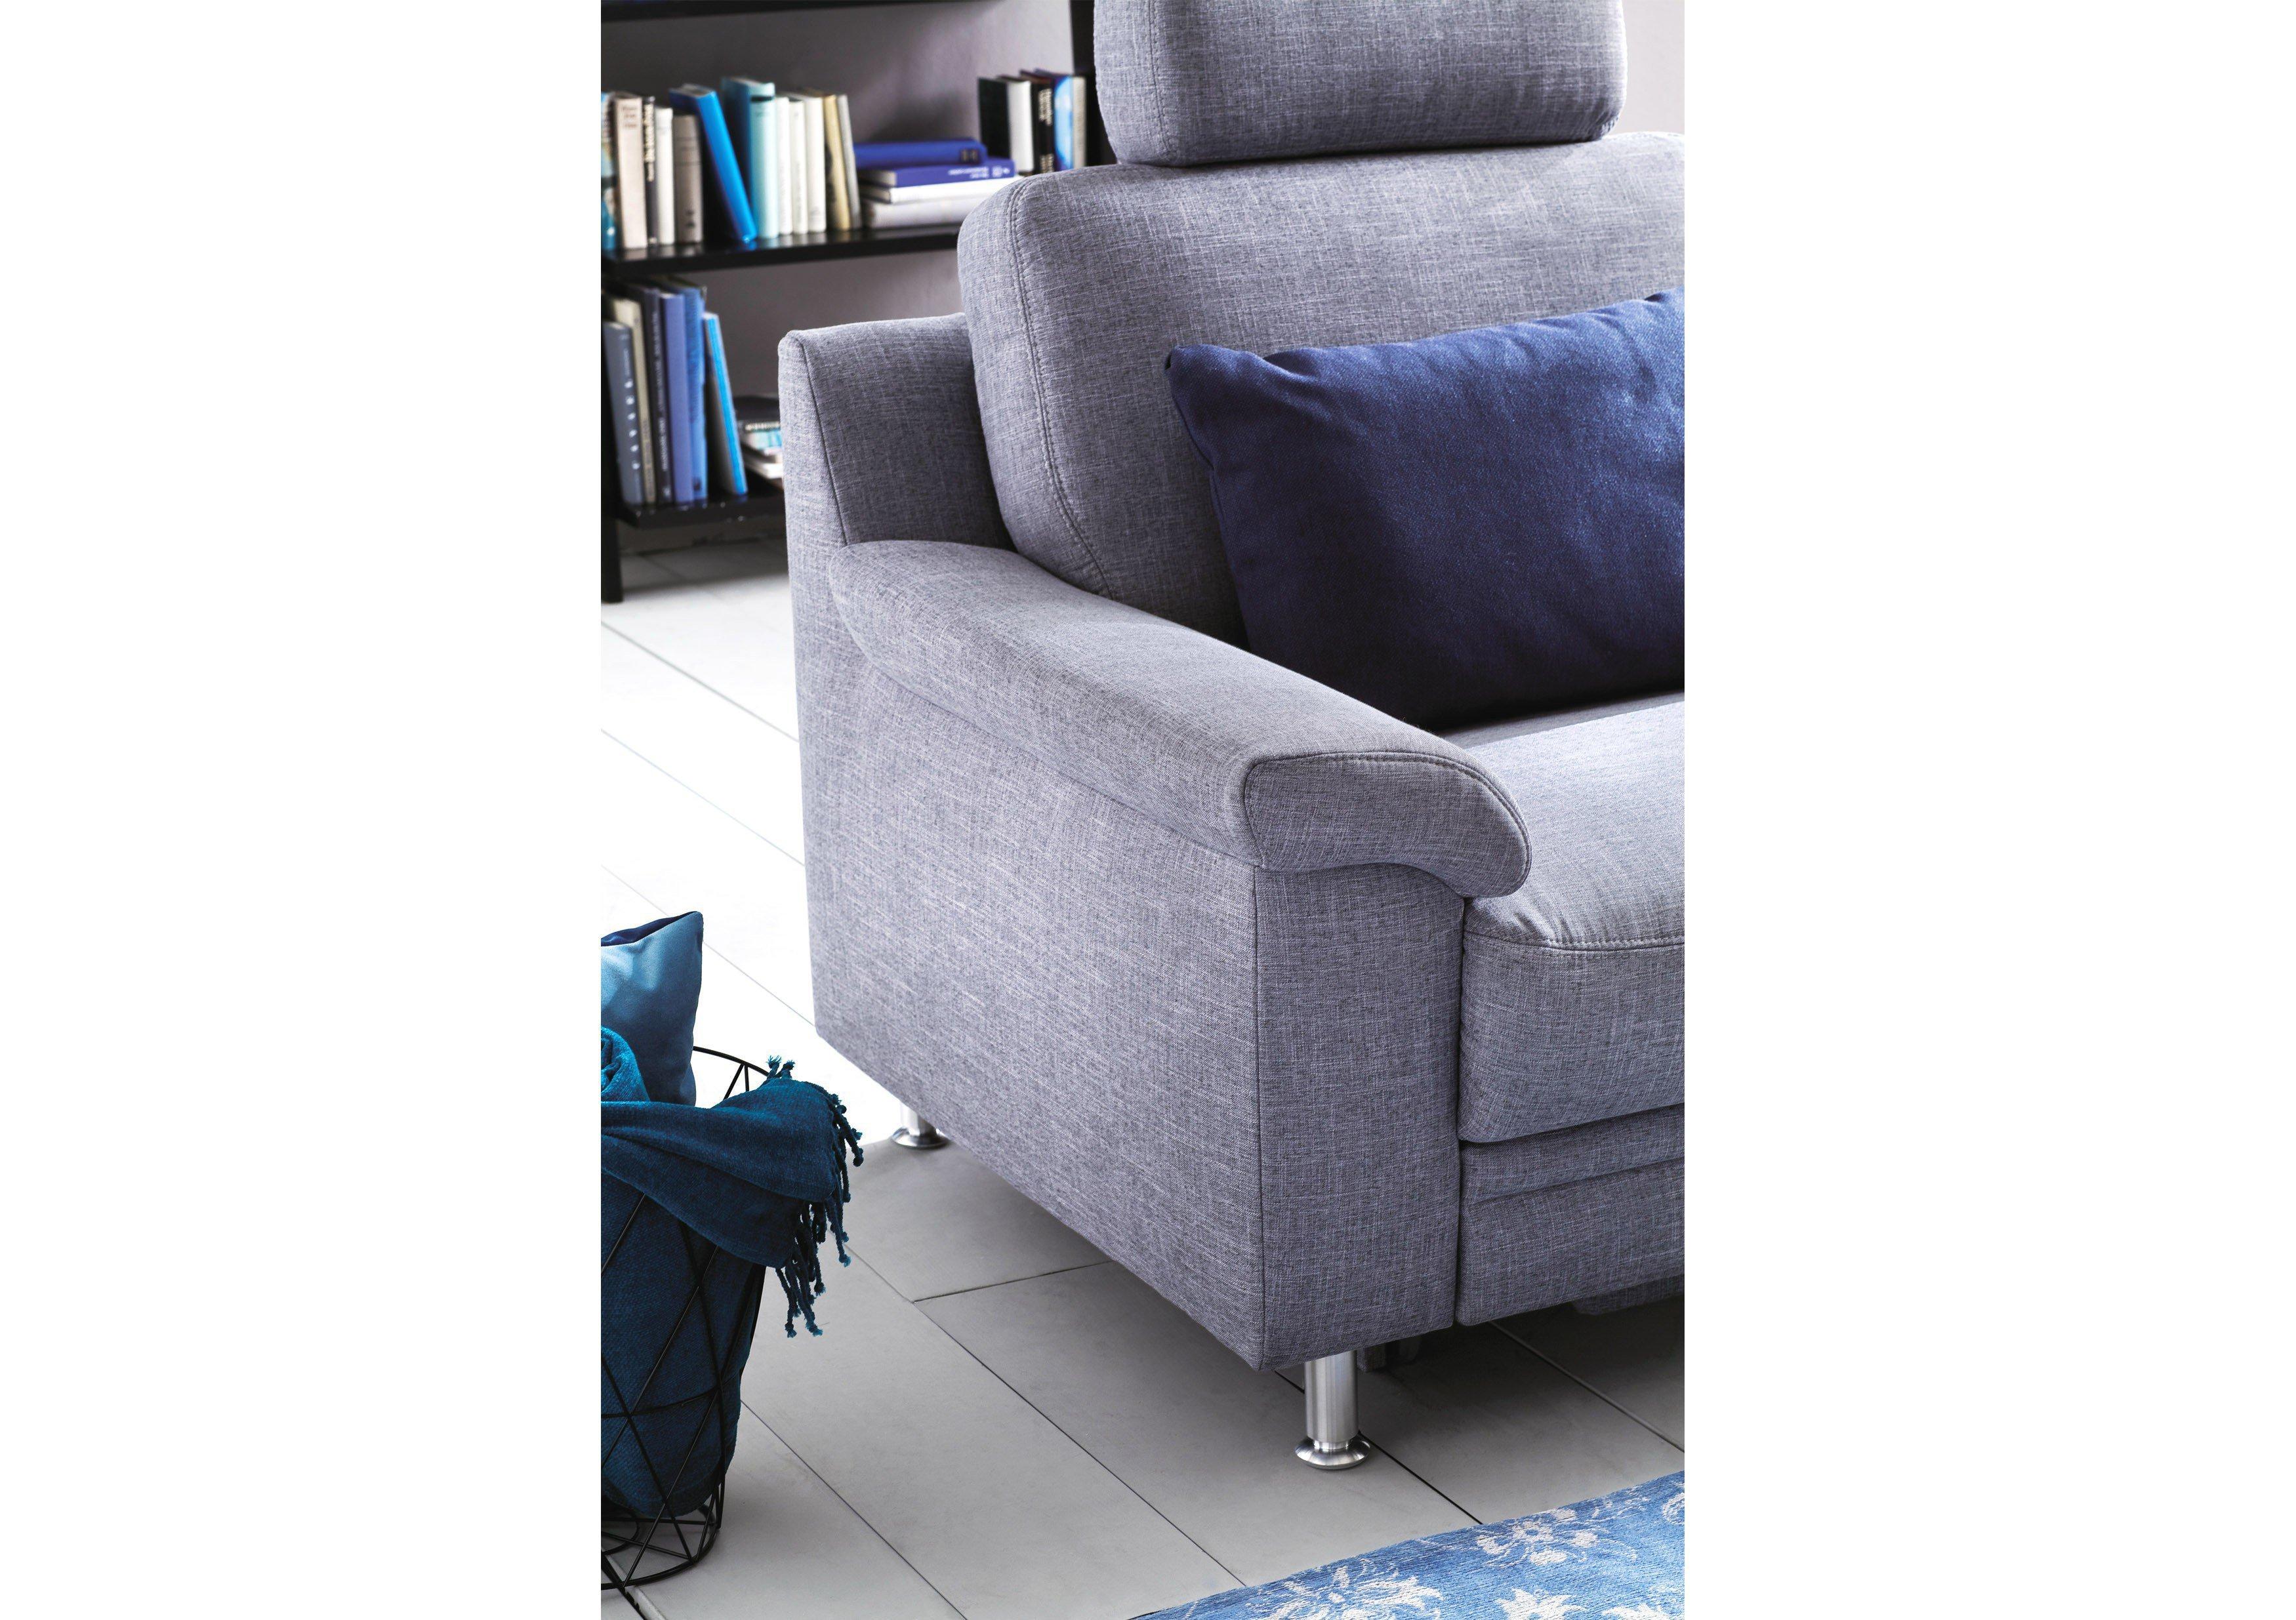 carina polsterm bel cora eckgarnitur in hellgrau m bel letz ihr online shop. Black Bedroom Furniture Sets. Home Design Ideas